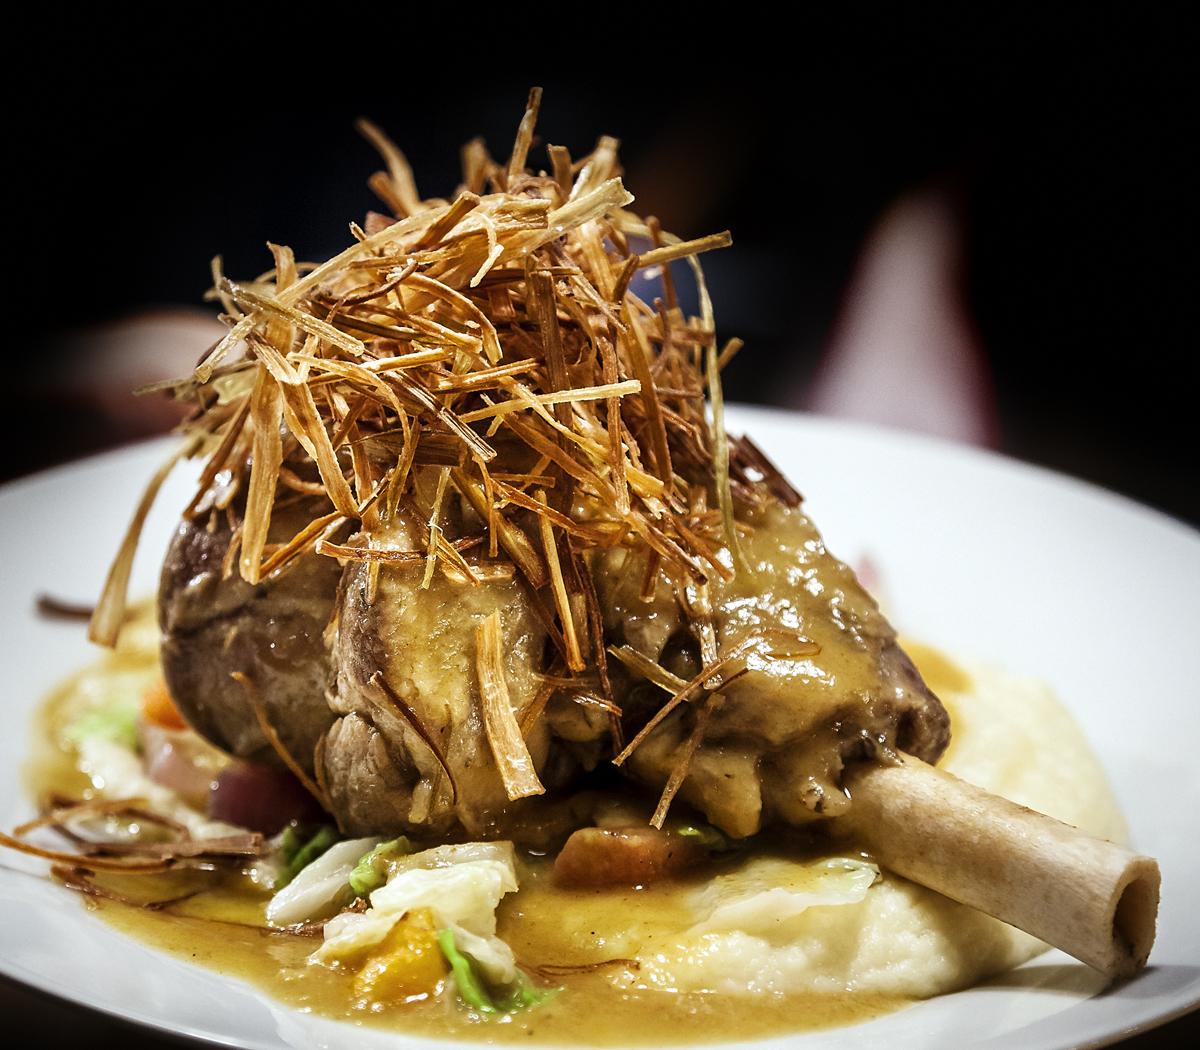 Cuisine bistro | Restaurant, auberge et microbrasserie située en Estrie | Auberge Sutton Brouërie